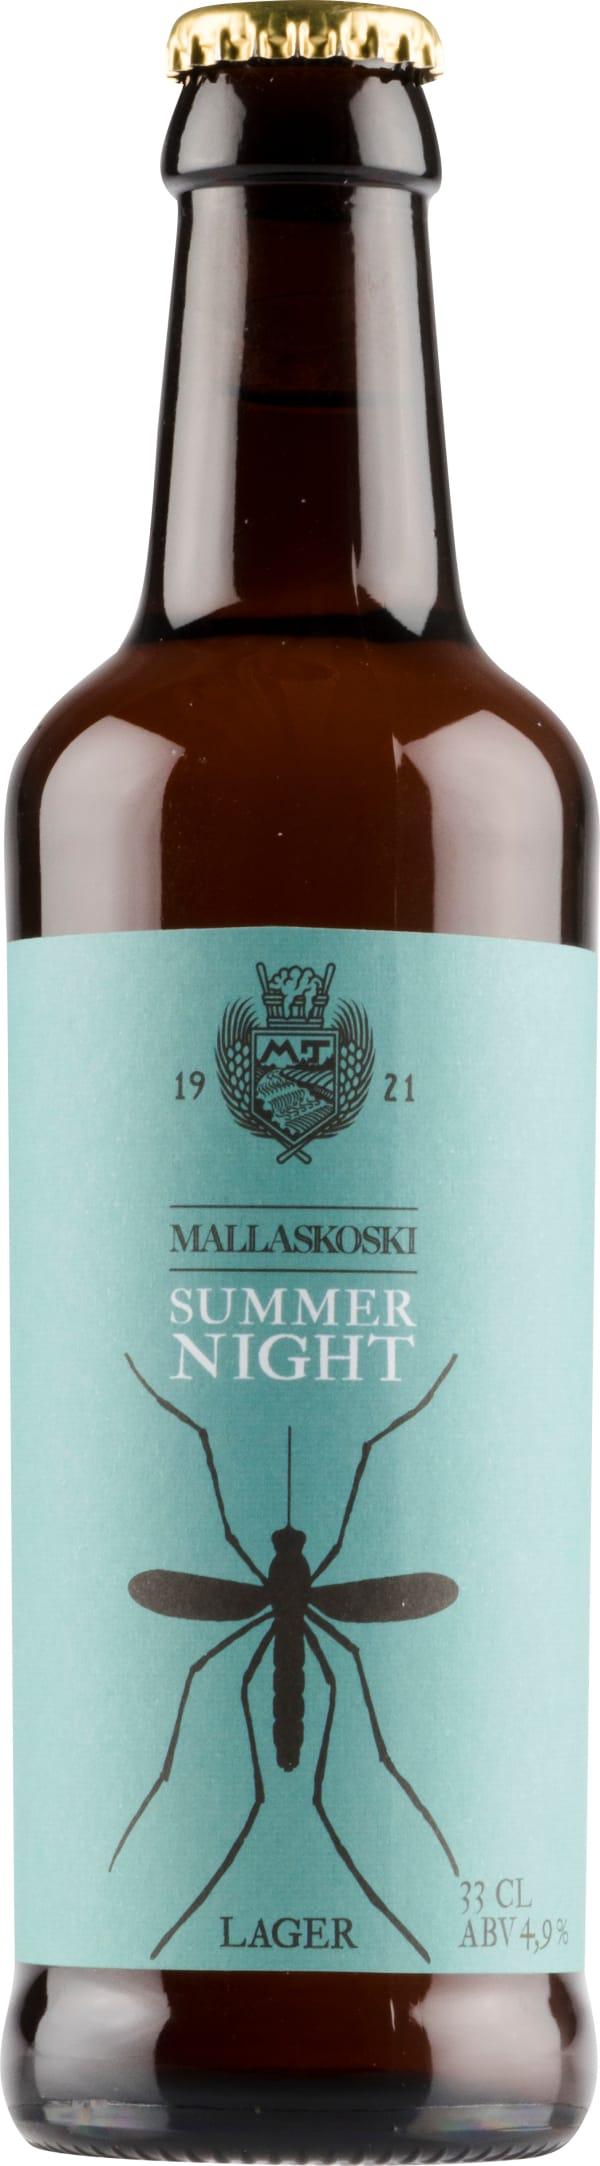 Mallaskosken Summer Night Lager